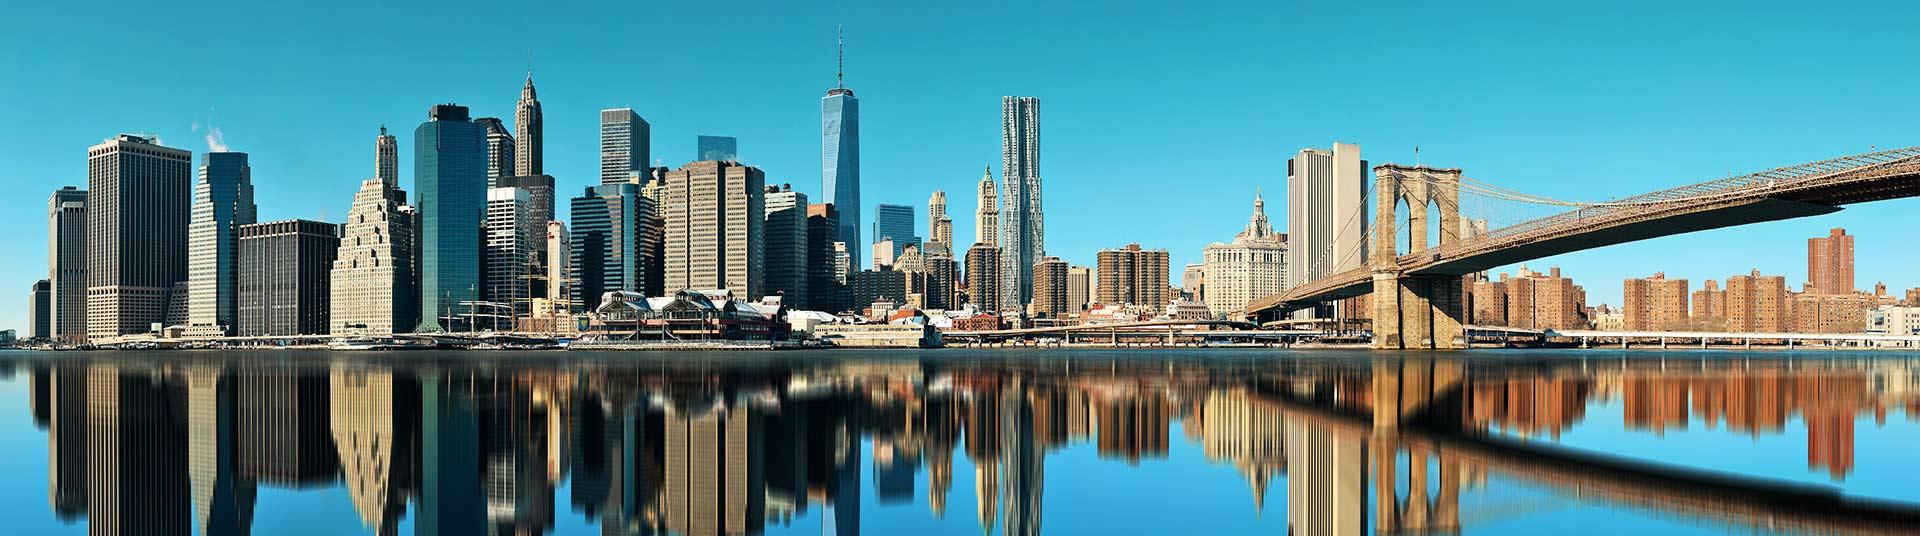 vol new york nyc billet d 39 avion new york pas cher avec. Black Bedroom Furniture Sets. Home Design Ideas